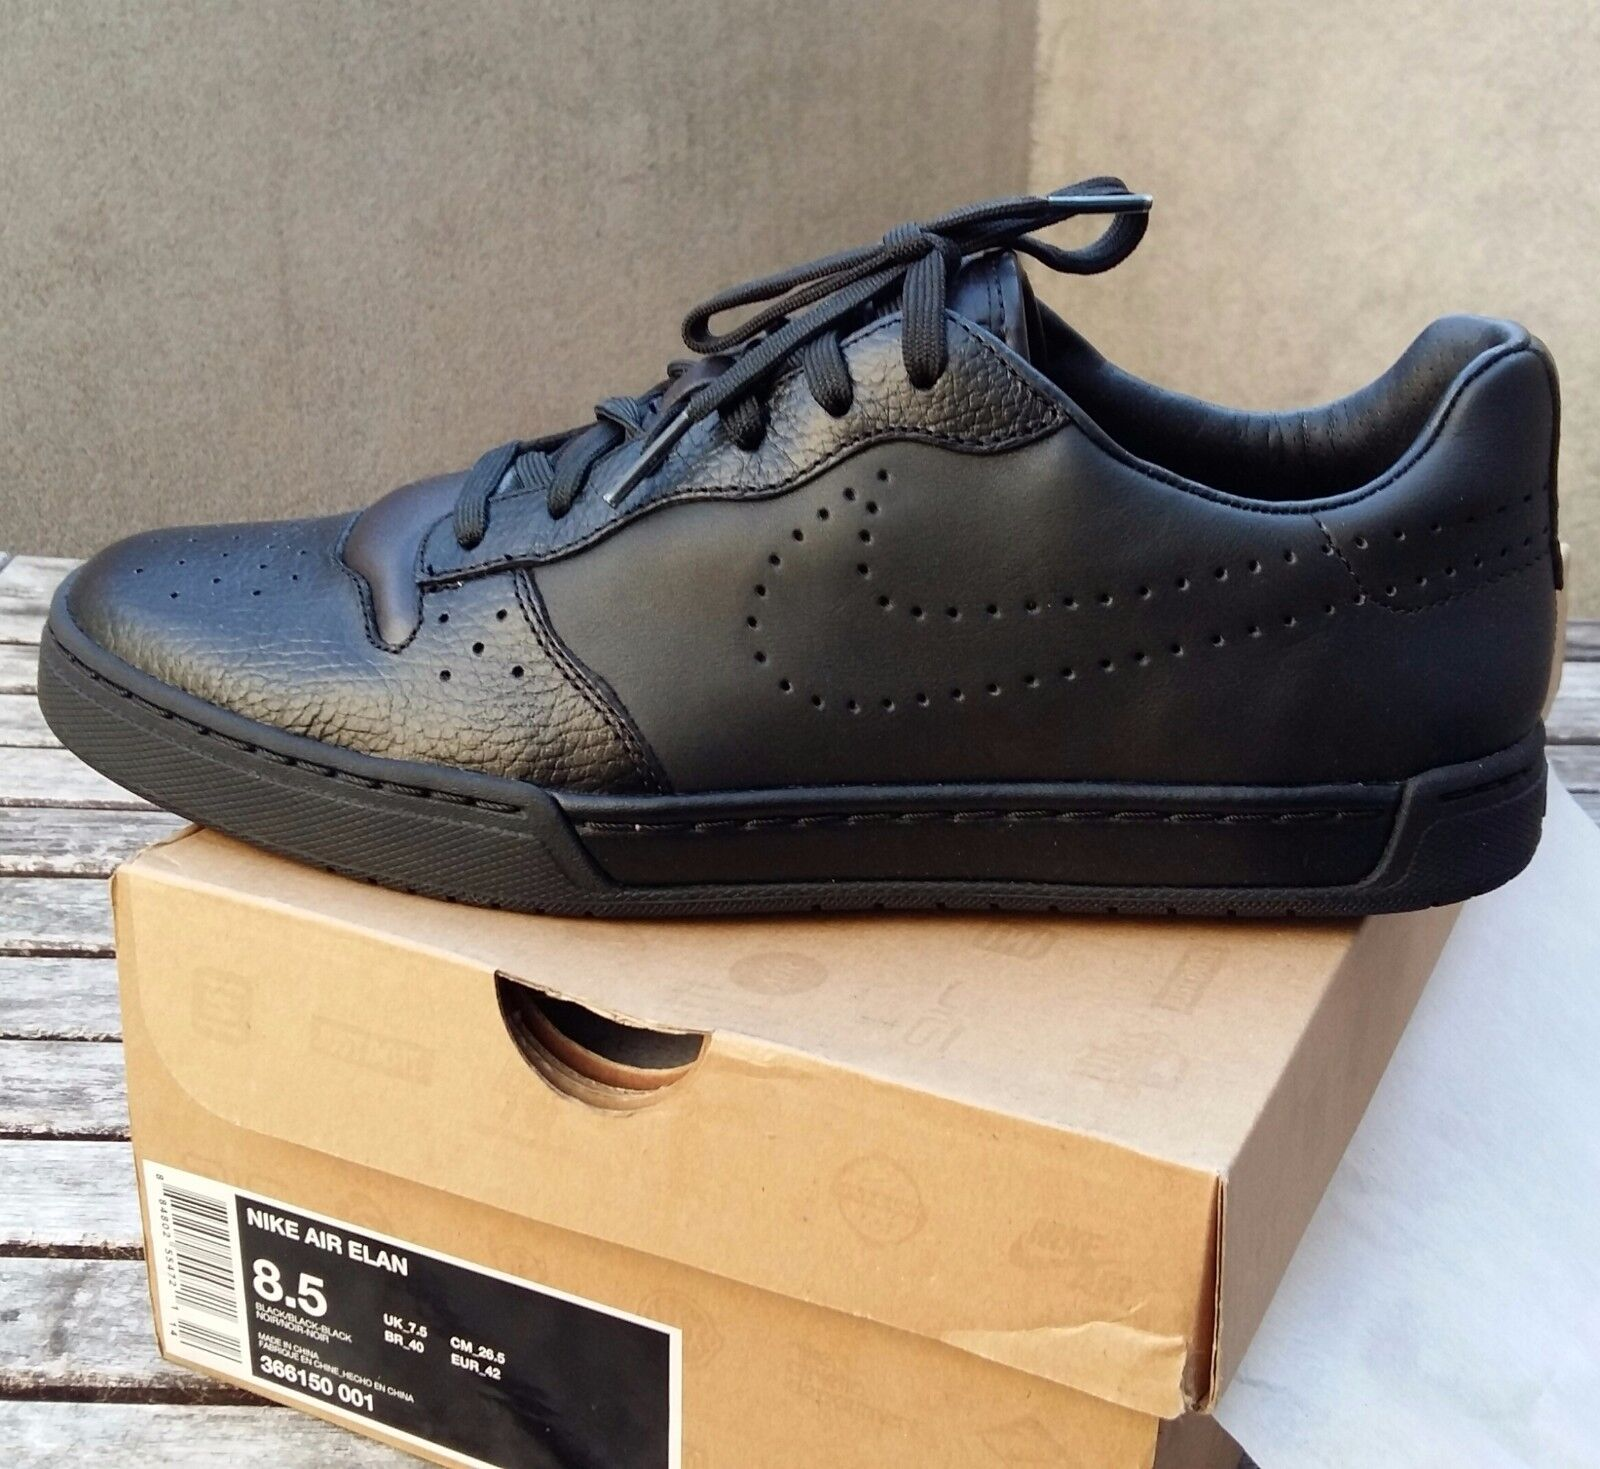 Nike Air ELAN US 8,5 EU 42 RARE bnib Premium Scarpe classiche da uomo